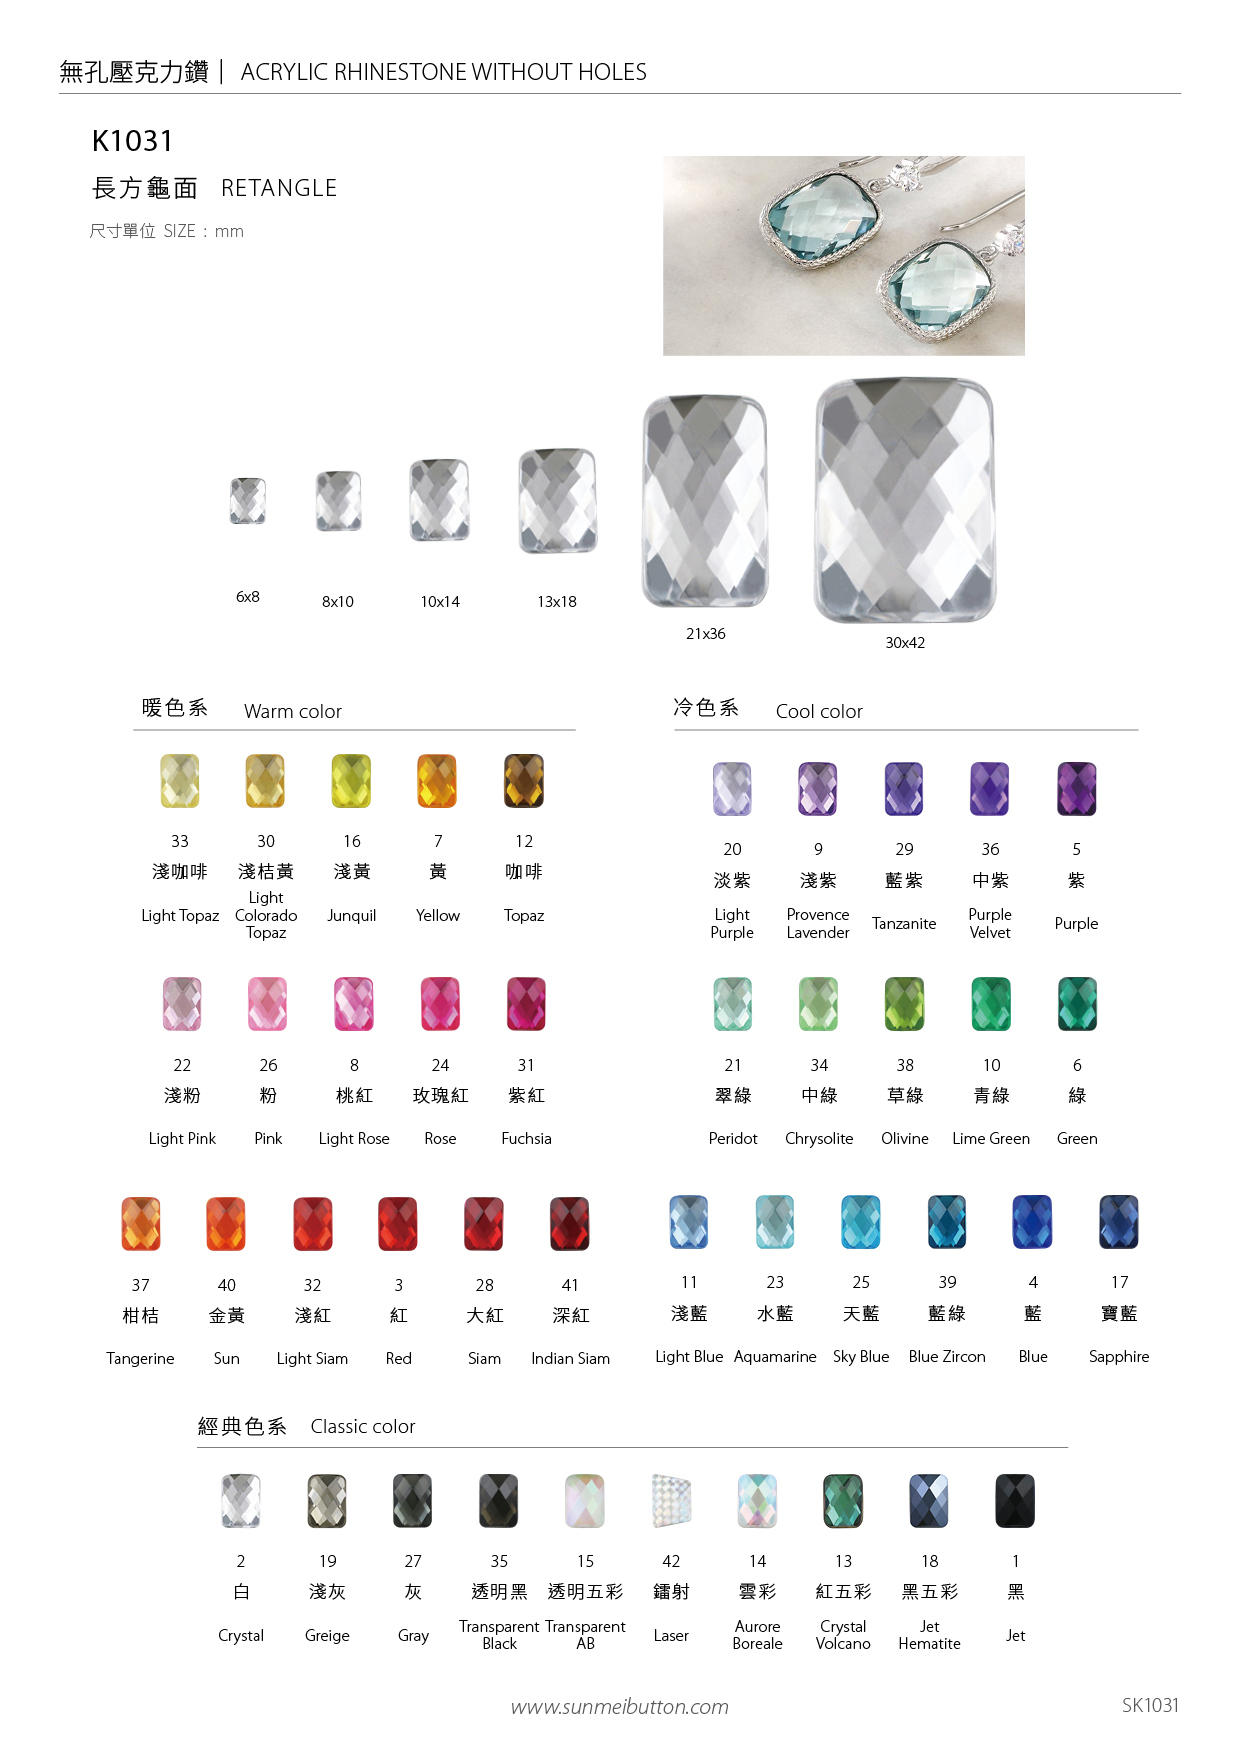 Top 1 Supplier Persegi Panjang Khusus Ukuran Besar 8X10Mm 10X14Mm 13X18Mm Plastik berlian Imitasi untuk Kerajinan, membuat Perhiasan, Riasan Wajah